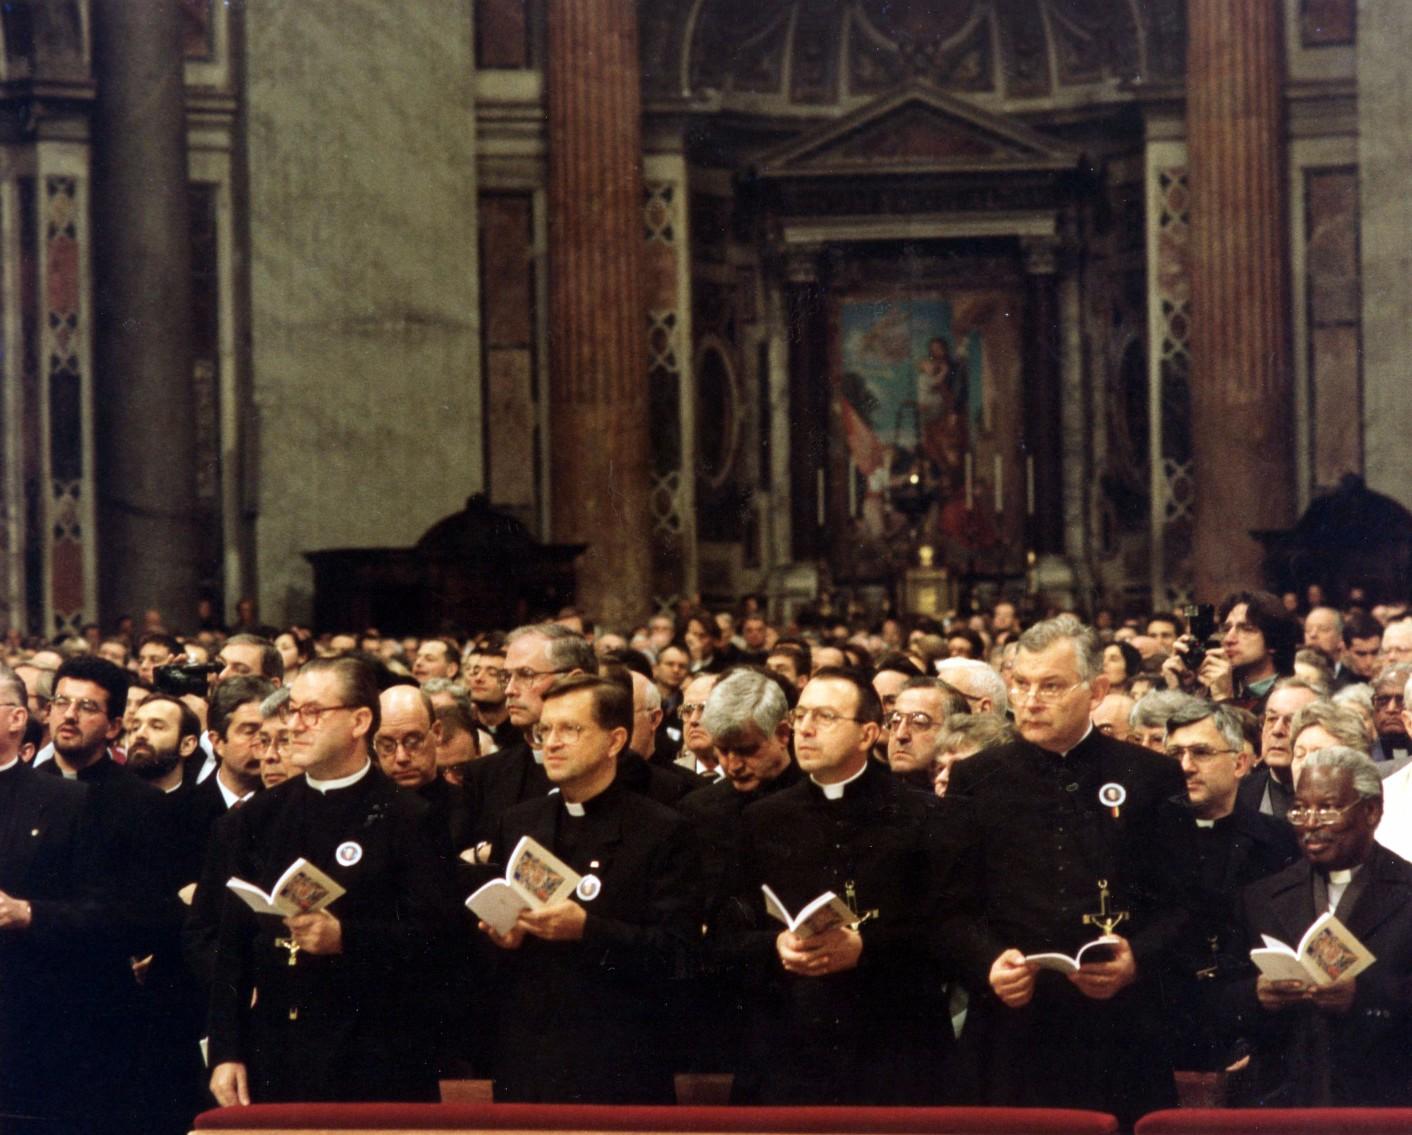 St. Eugene de Mazenod - Canonization (03-12-1995)